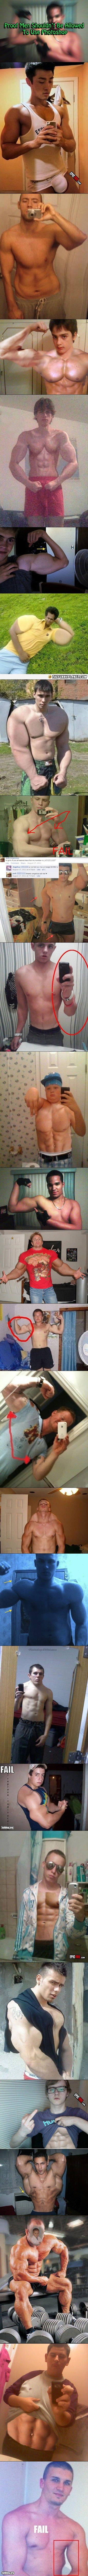 Muscle guys photoshop fails